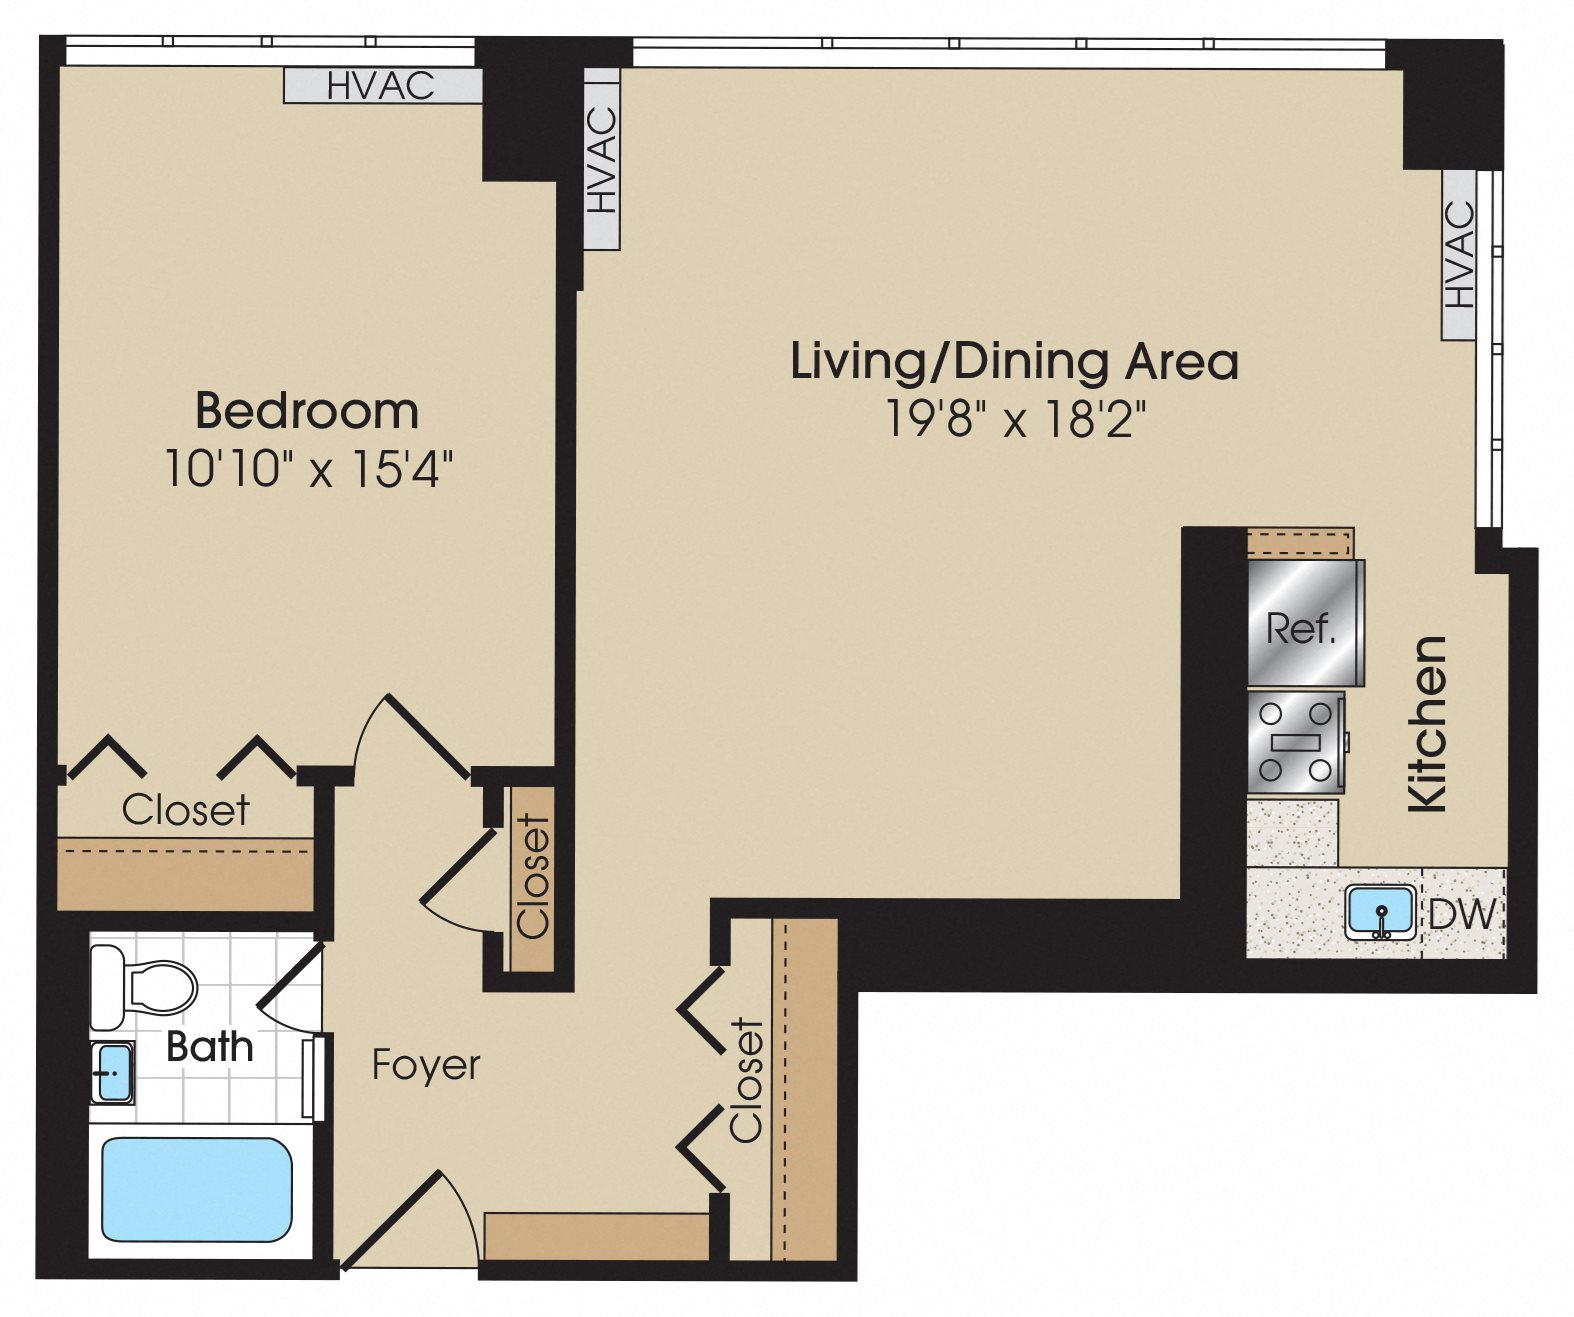 One Bedroom Studio Apartment: Studio & 1 Bedroom Apartment